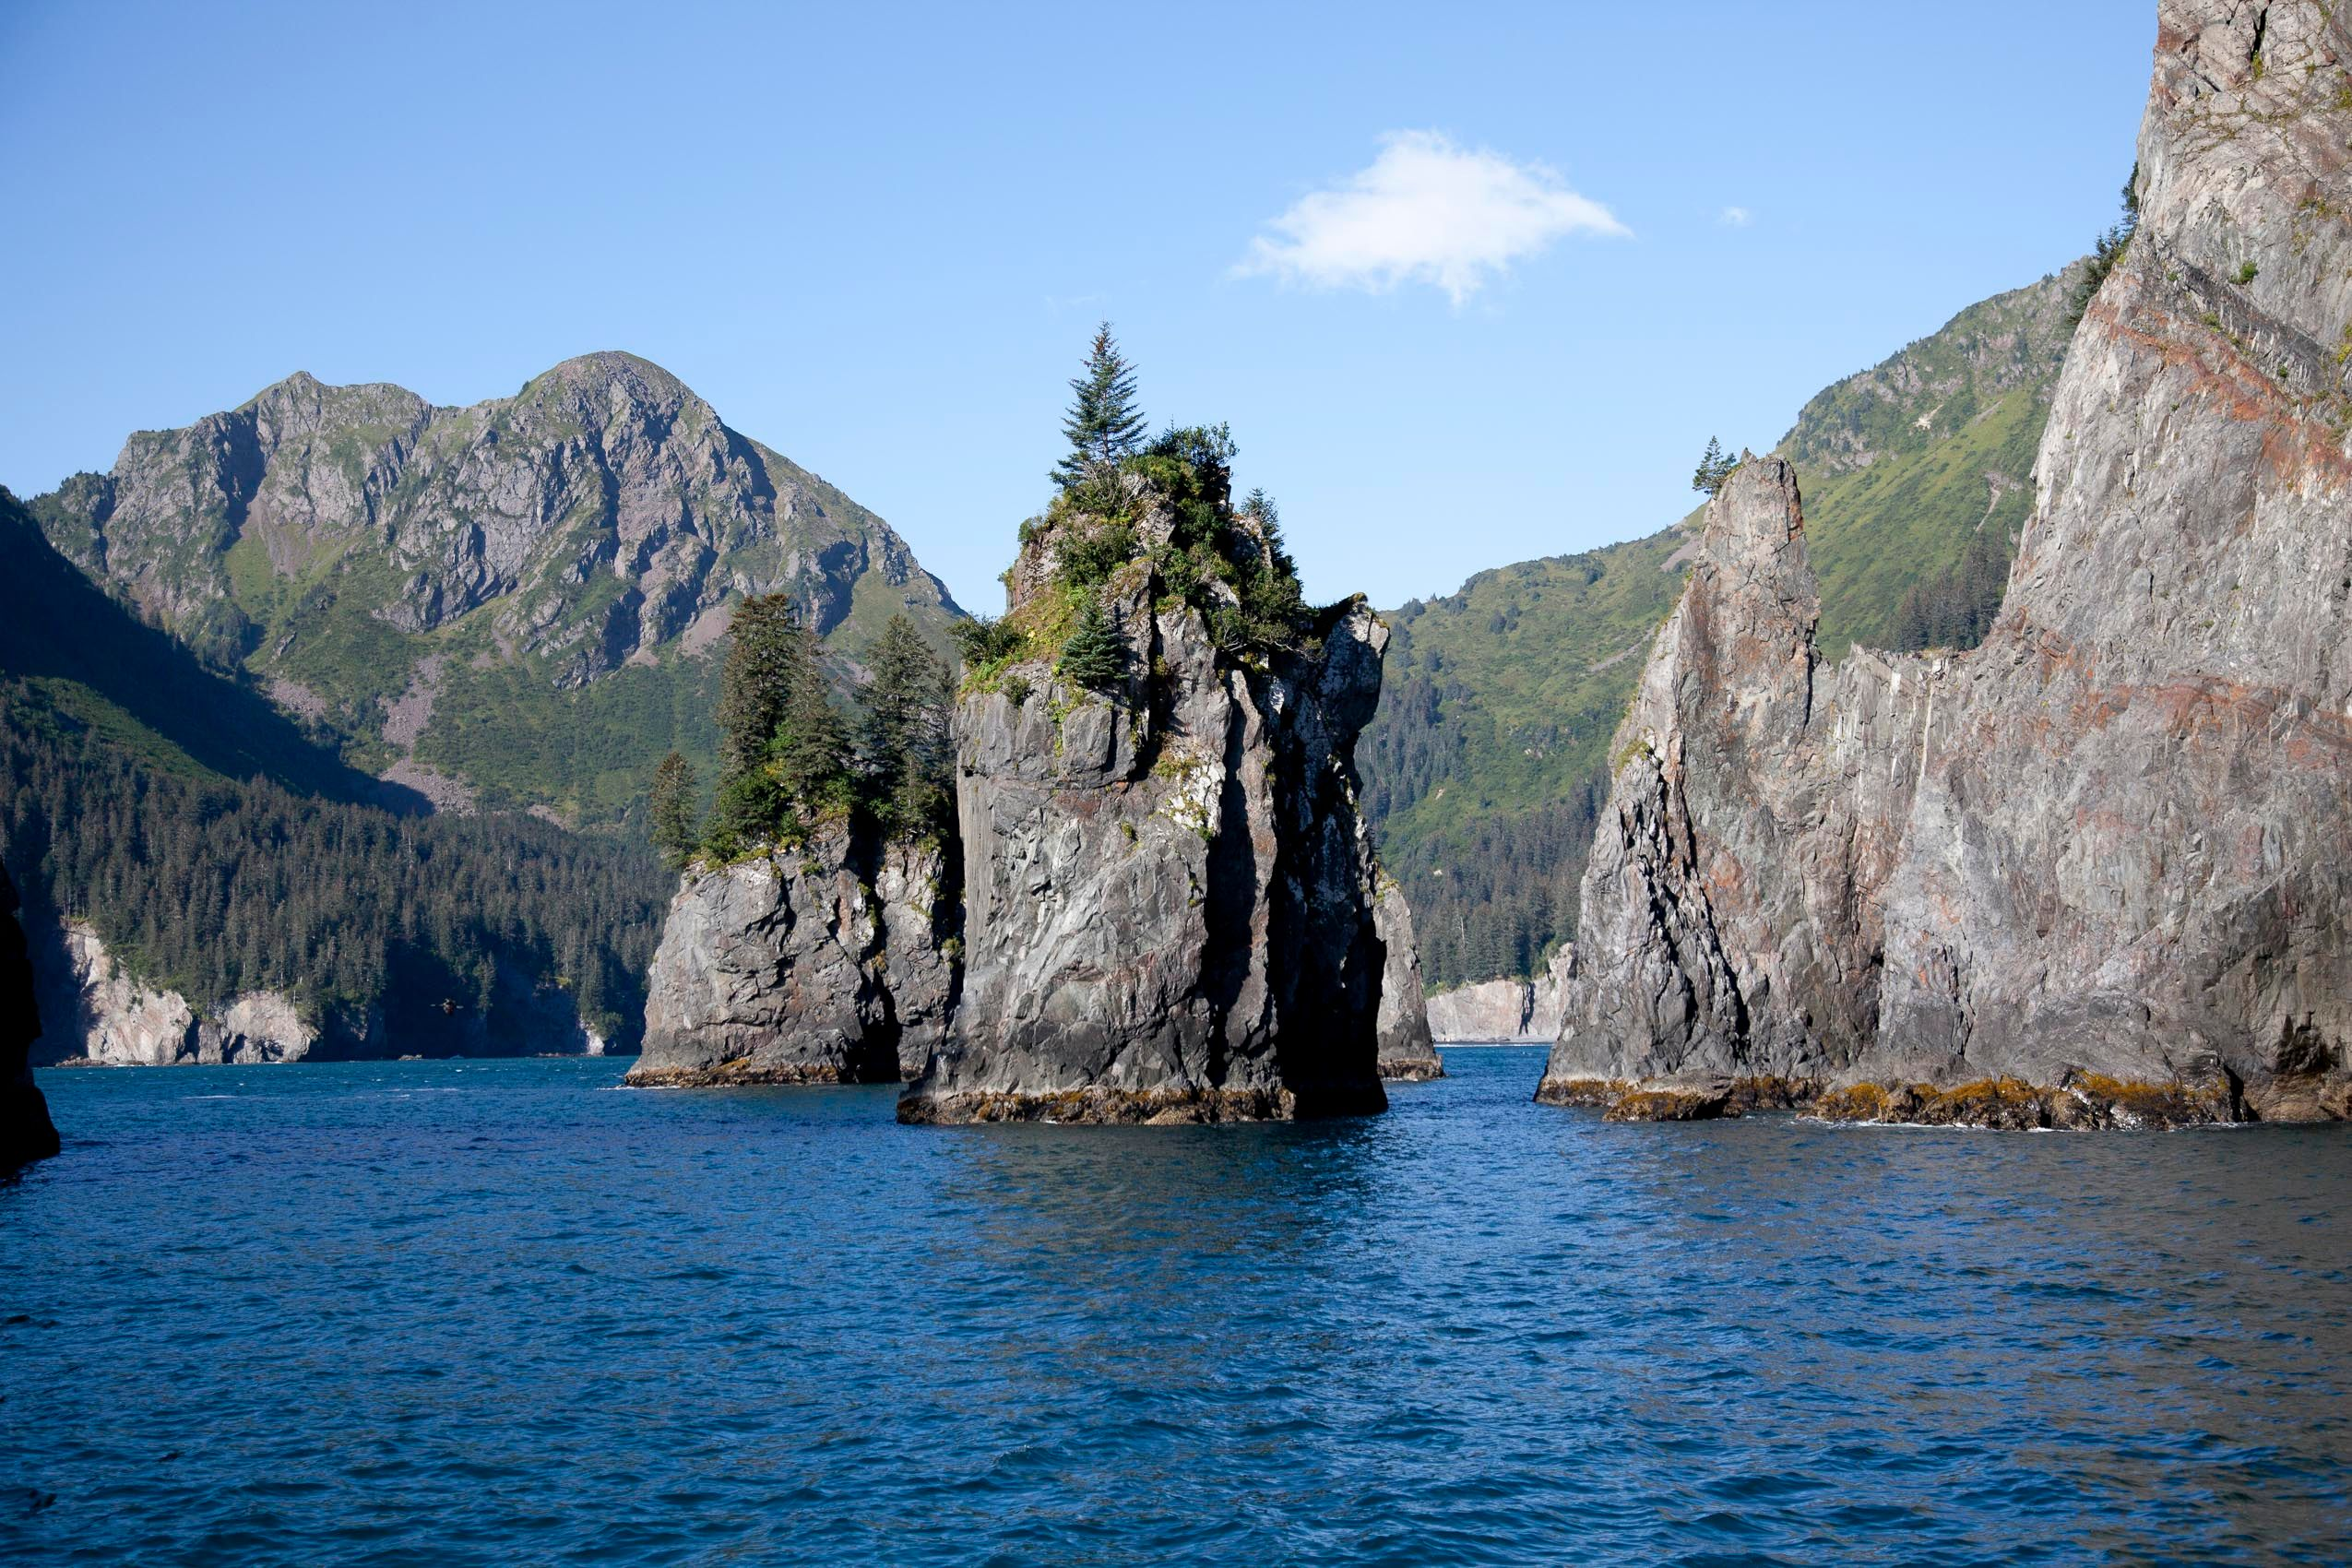 alaska_halibut_cove_boat_trip.jpg